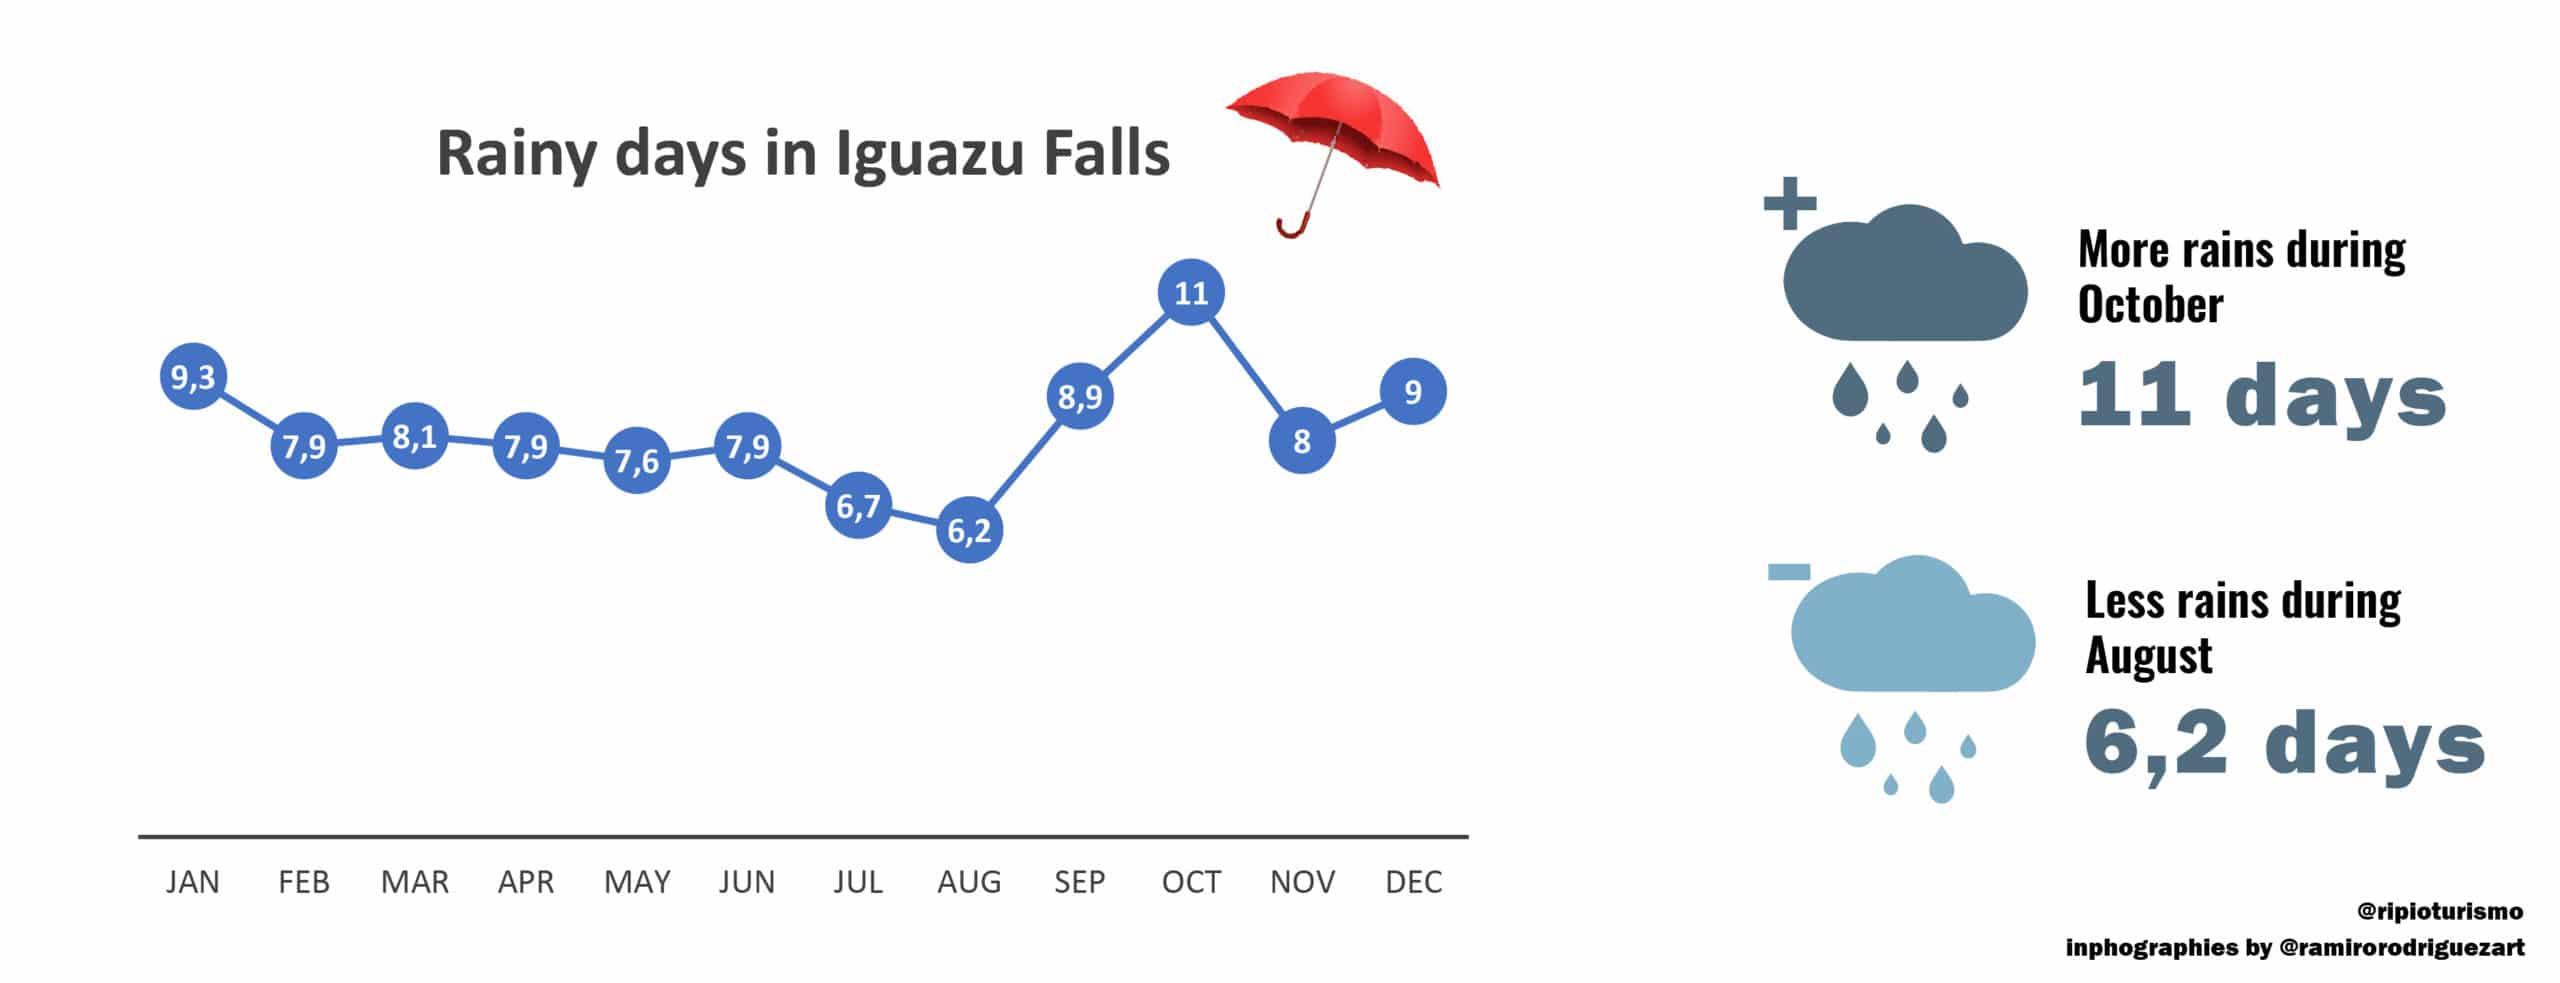 Rainy season in Iguazu Falls. Rainy days. Weather in Iguazu Falls, RipioTurismo DMC for Argentina